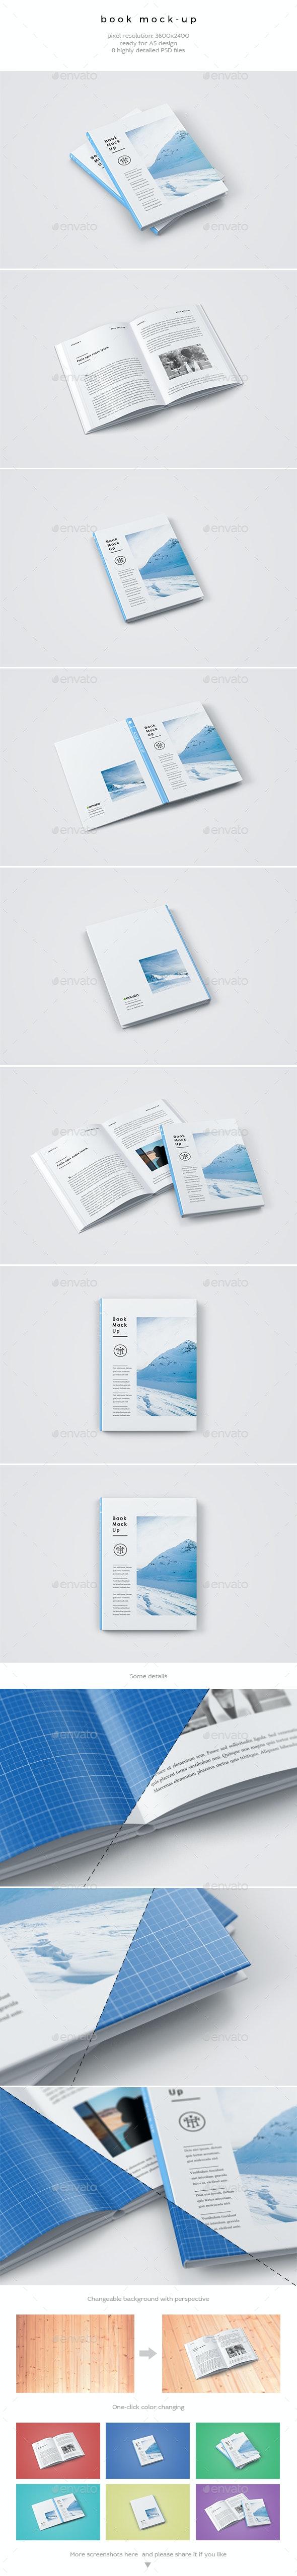 Book Mock-Up - Books Print